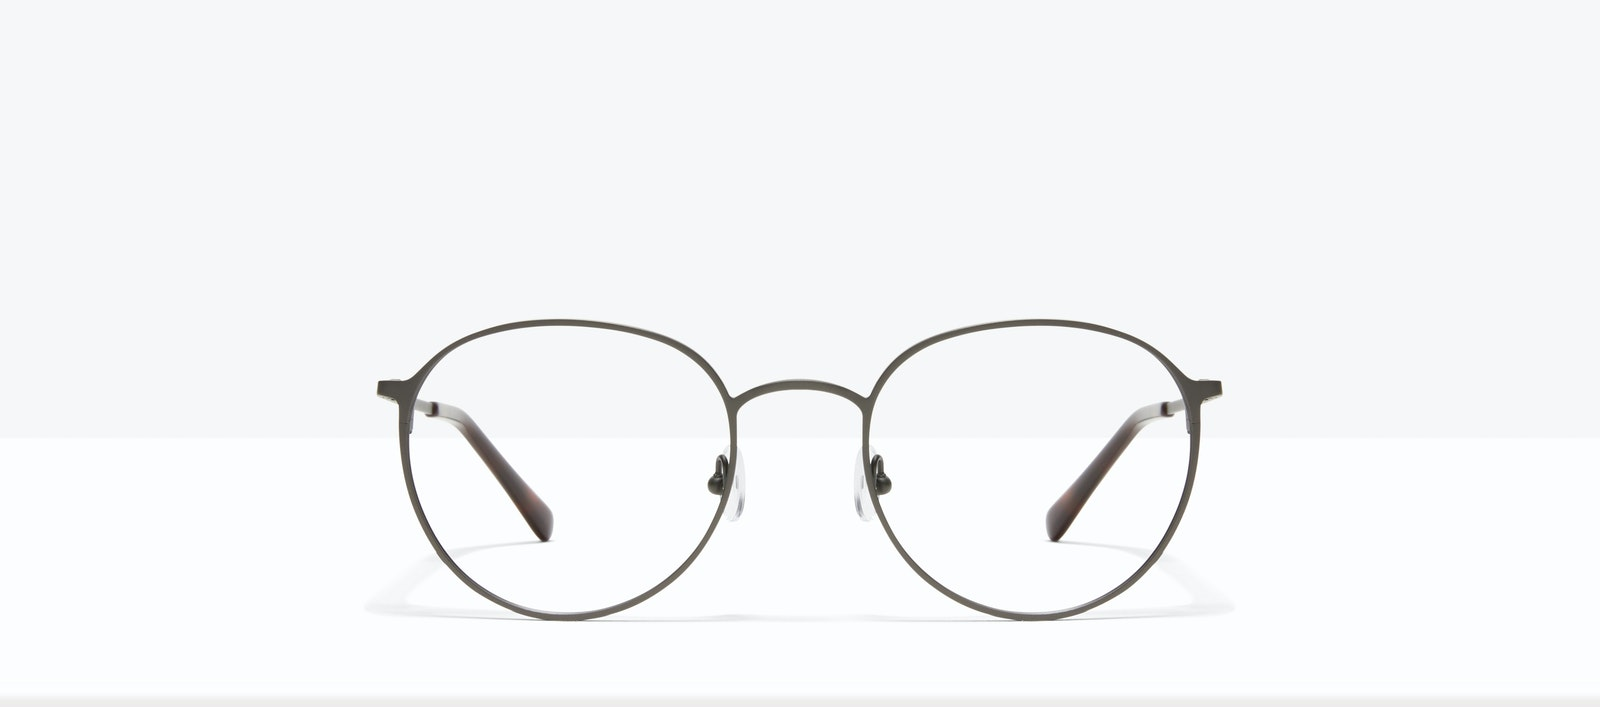 Affordable Fashion Glasses Round Eyeglasses Men Ridge Carbon Front